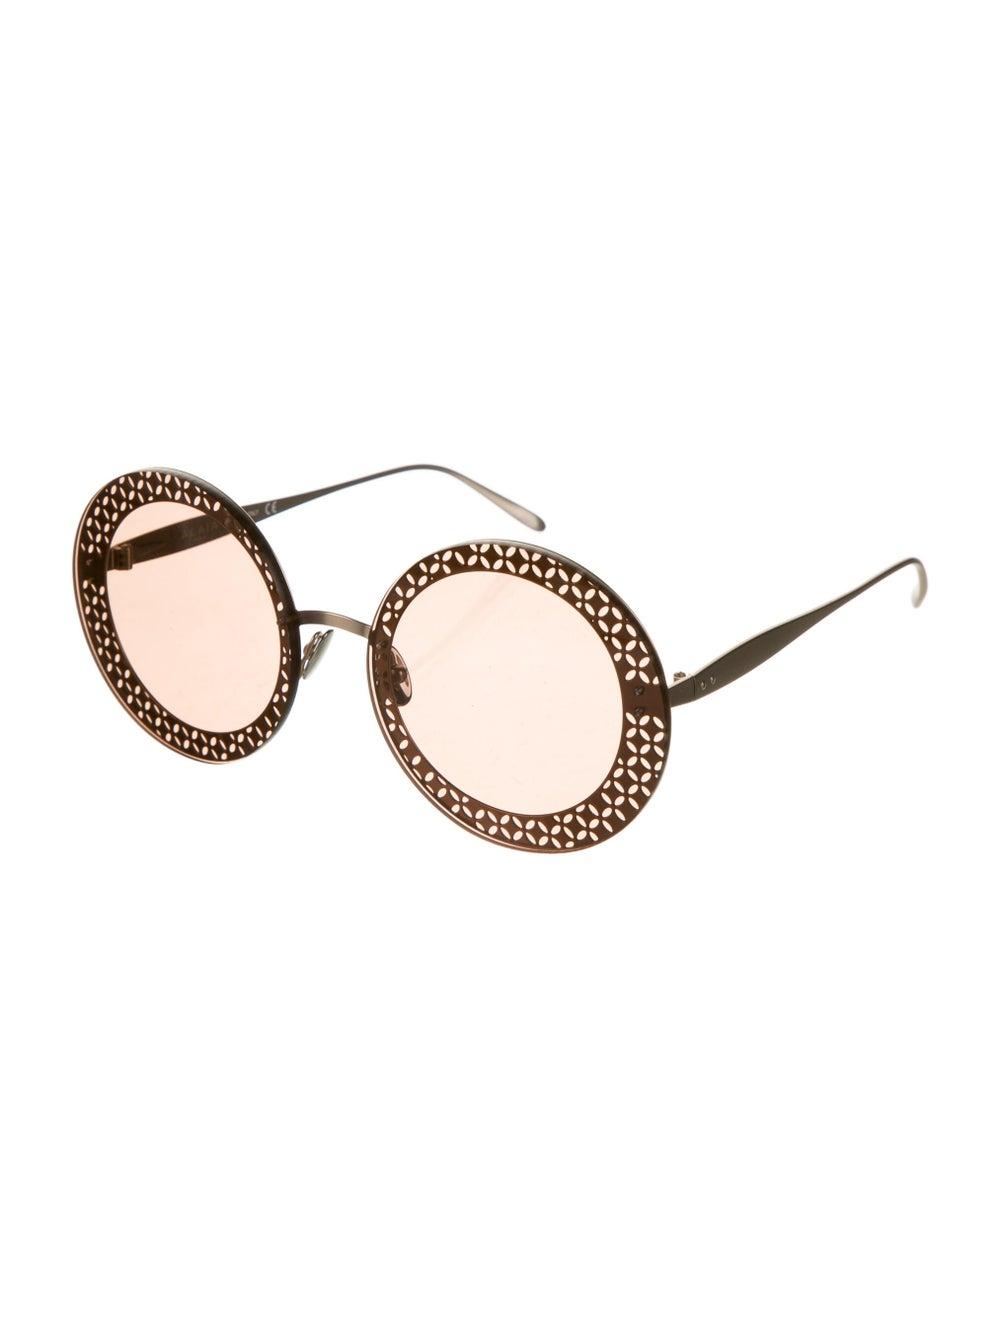 Alaïa Round Tinted Sunglasses - image 2